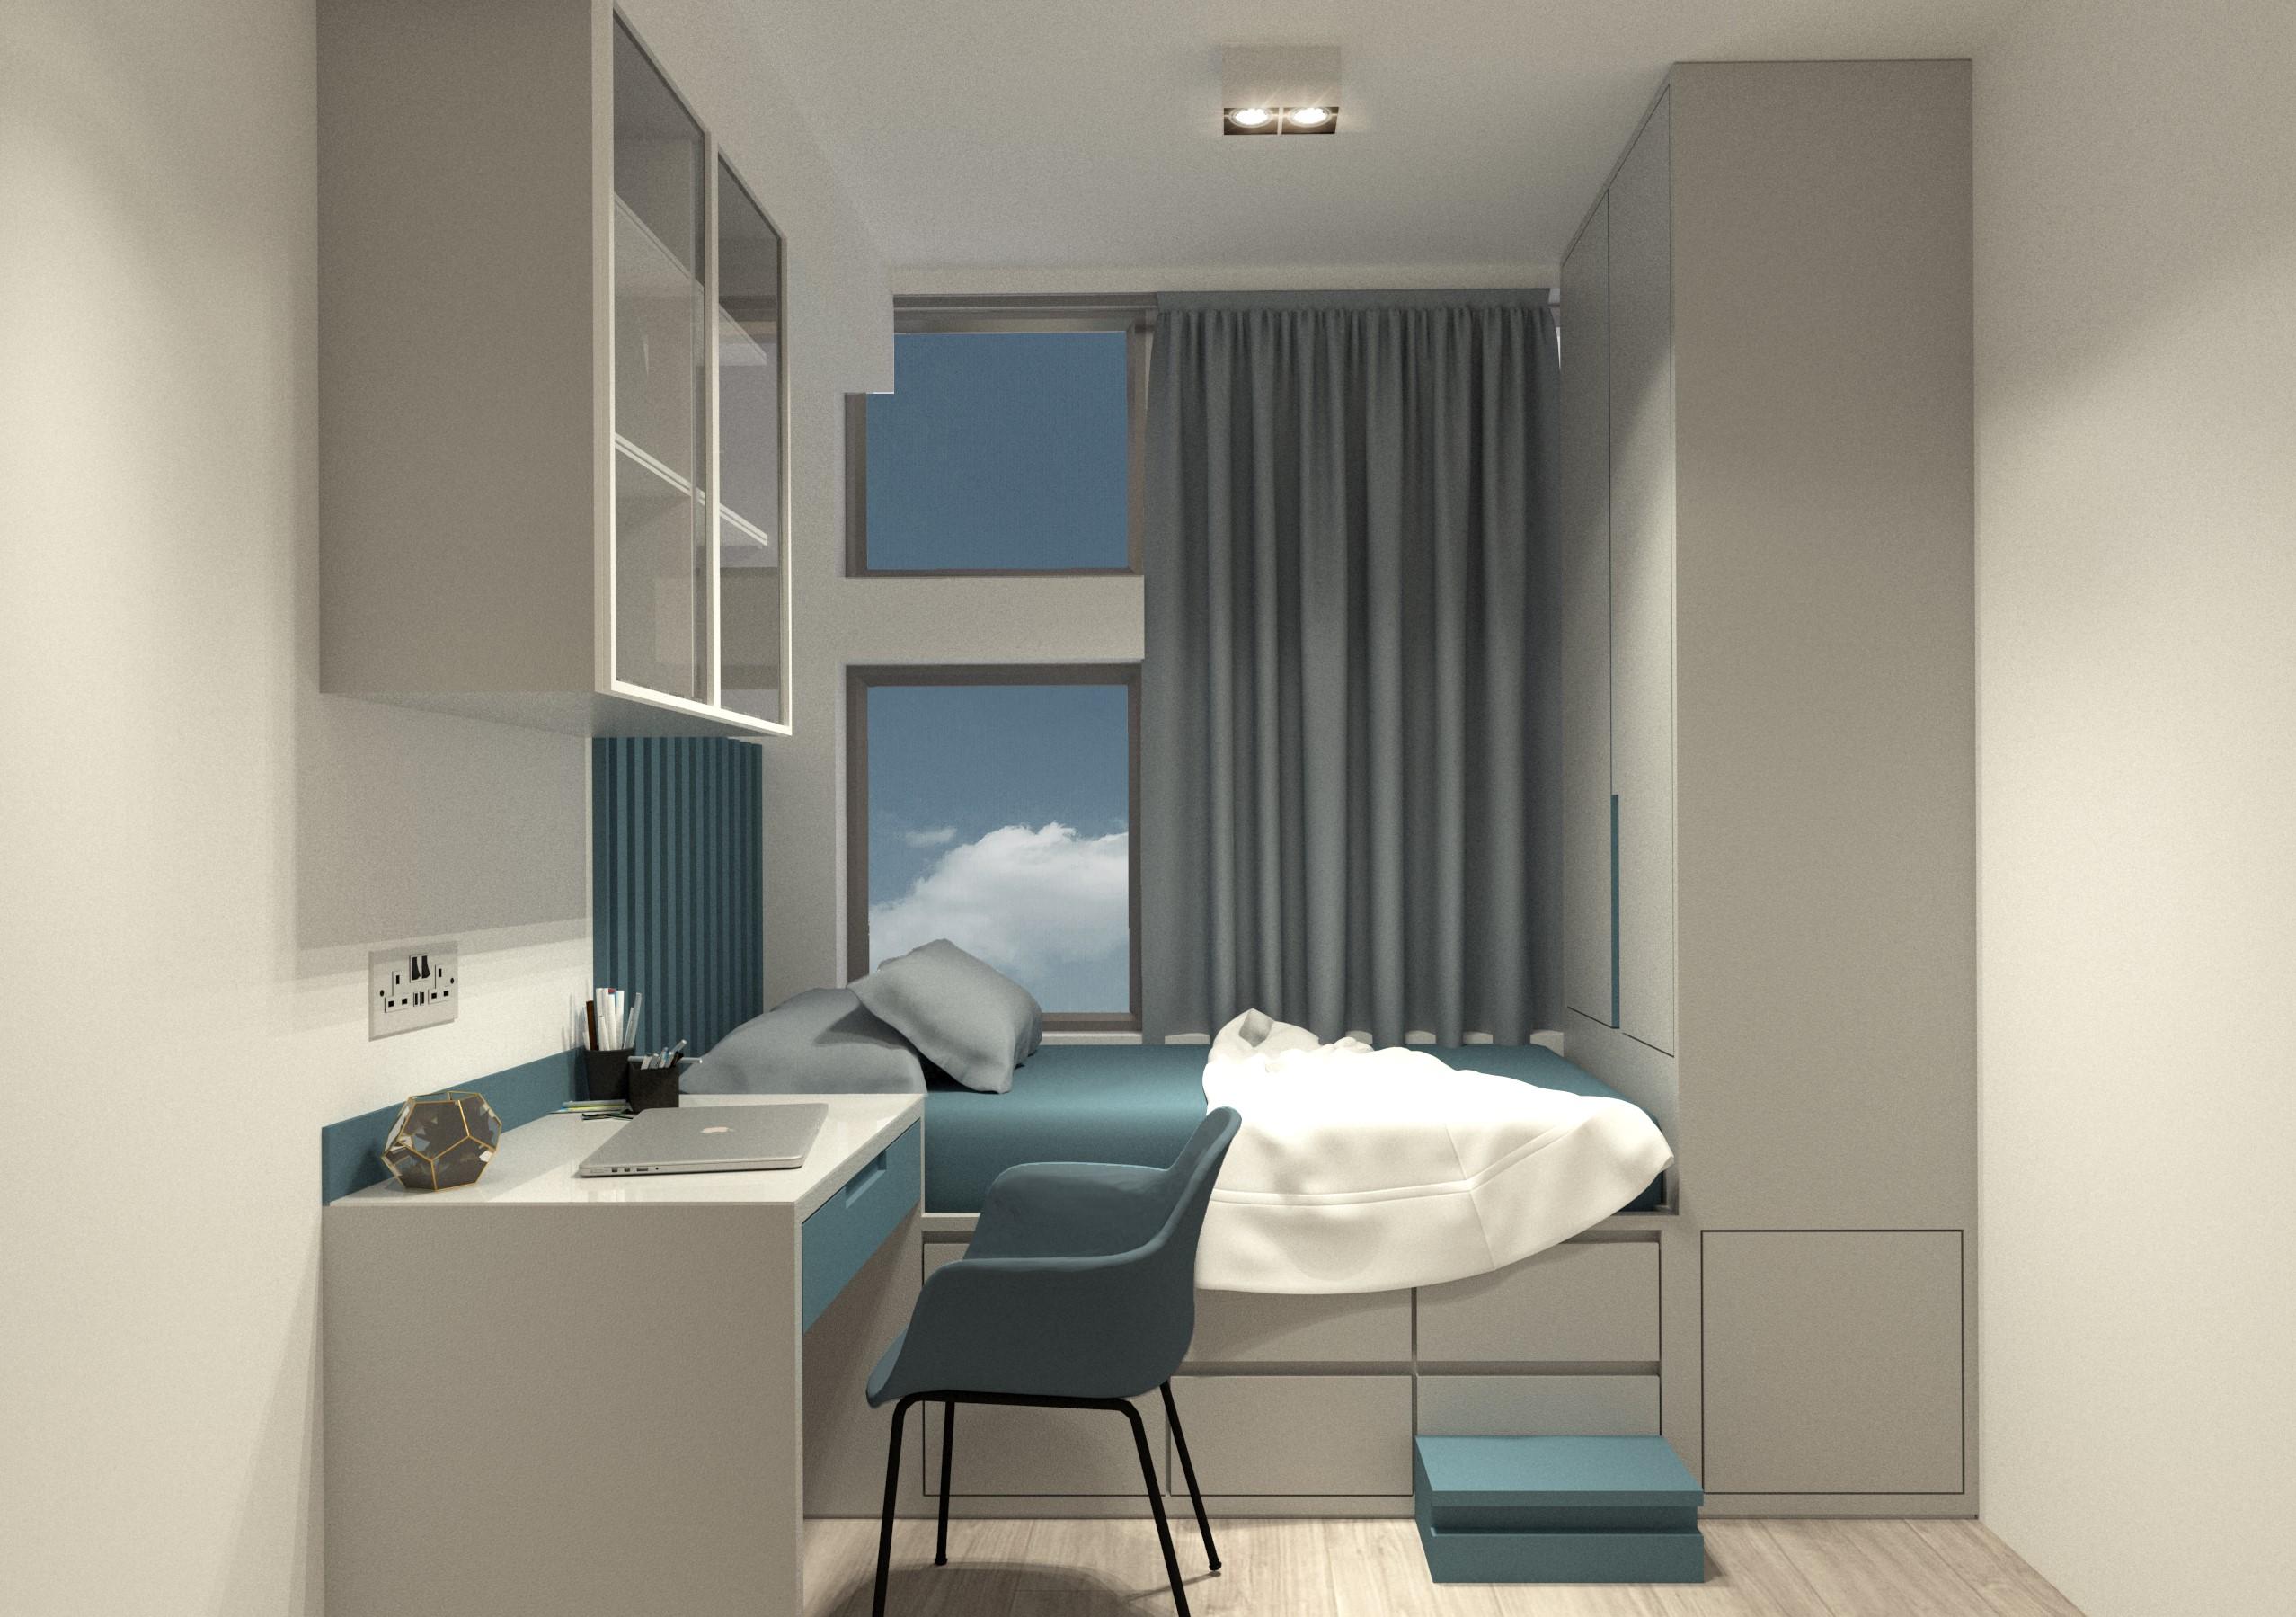 Inch Interior Design Hong Kong Shek Mun Estate | Concept